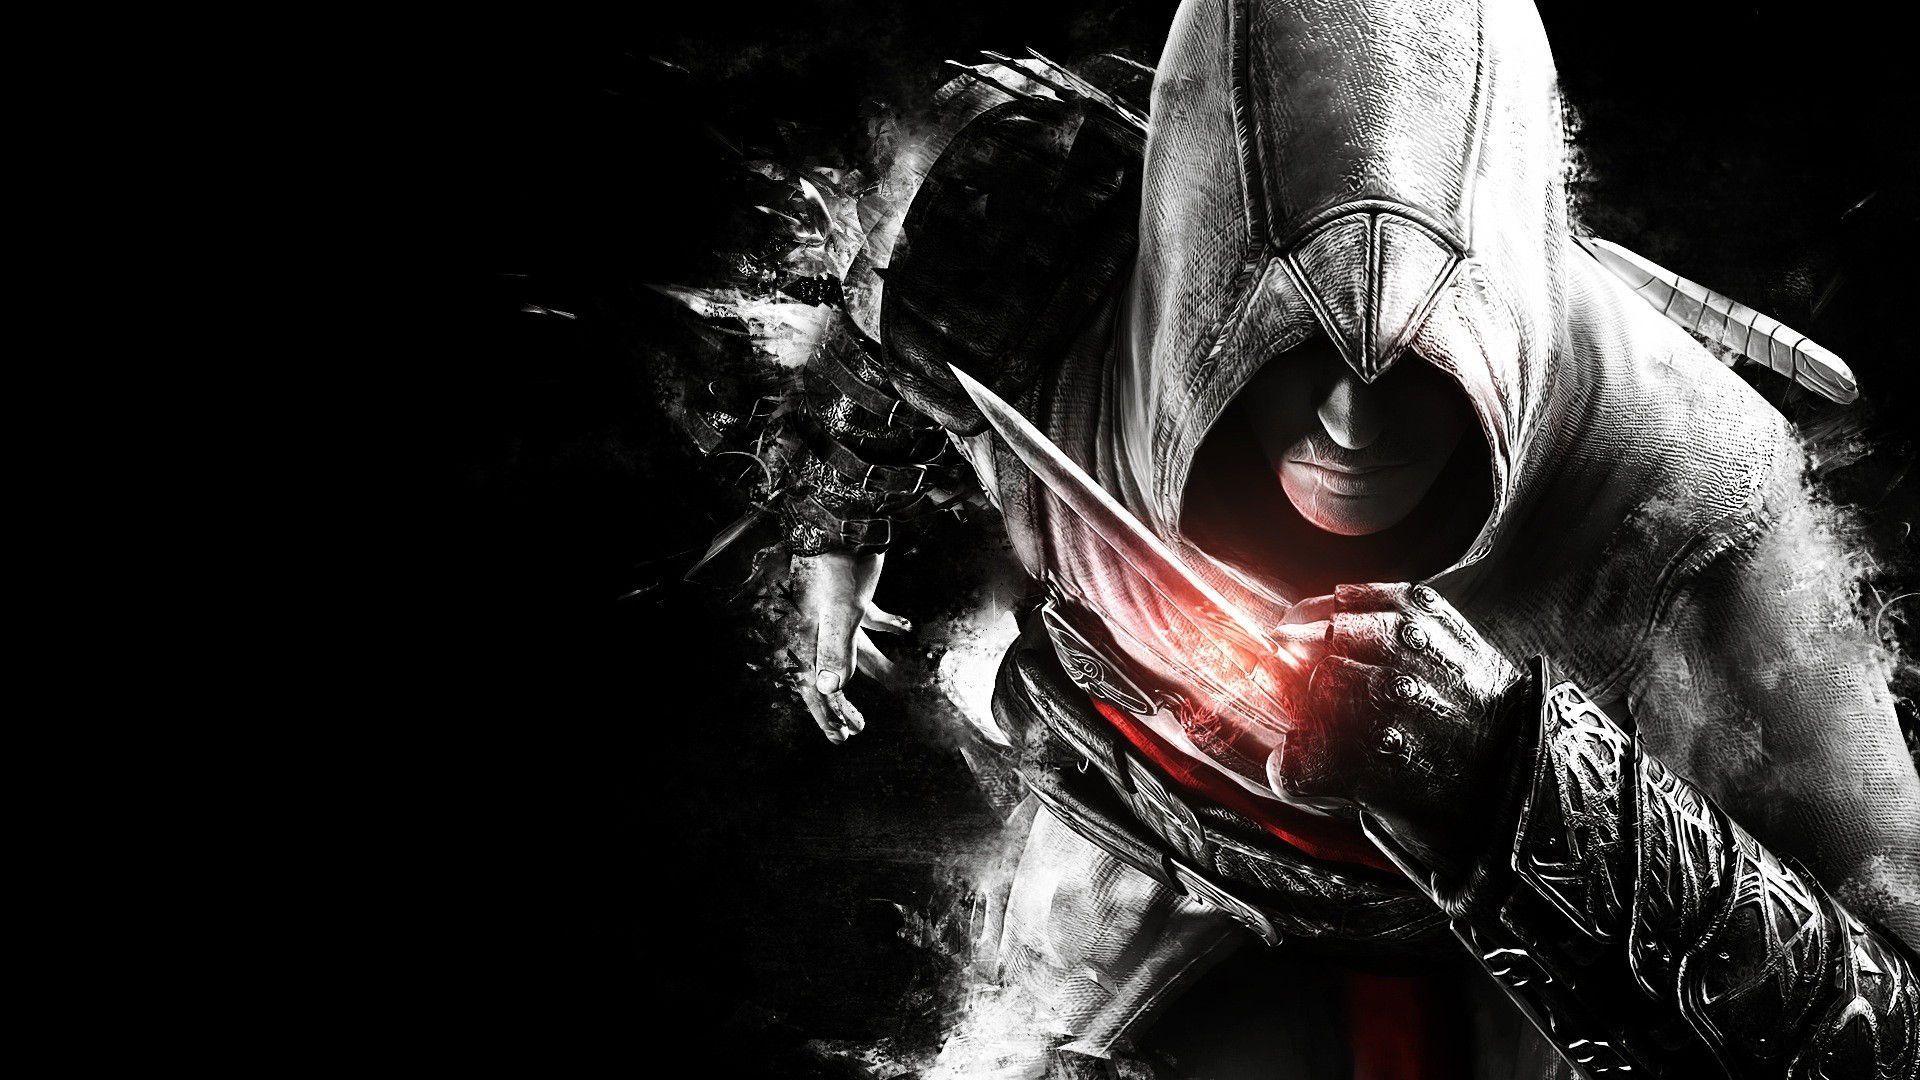 assassins creed wallpaper hd 1080p